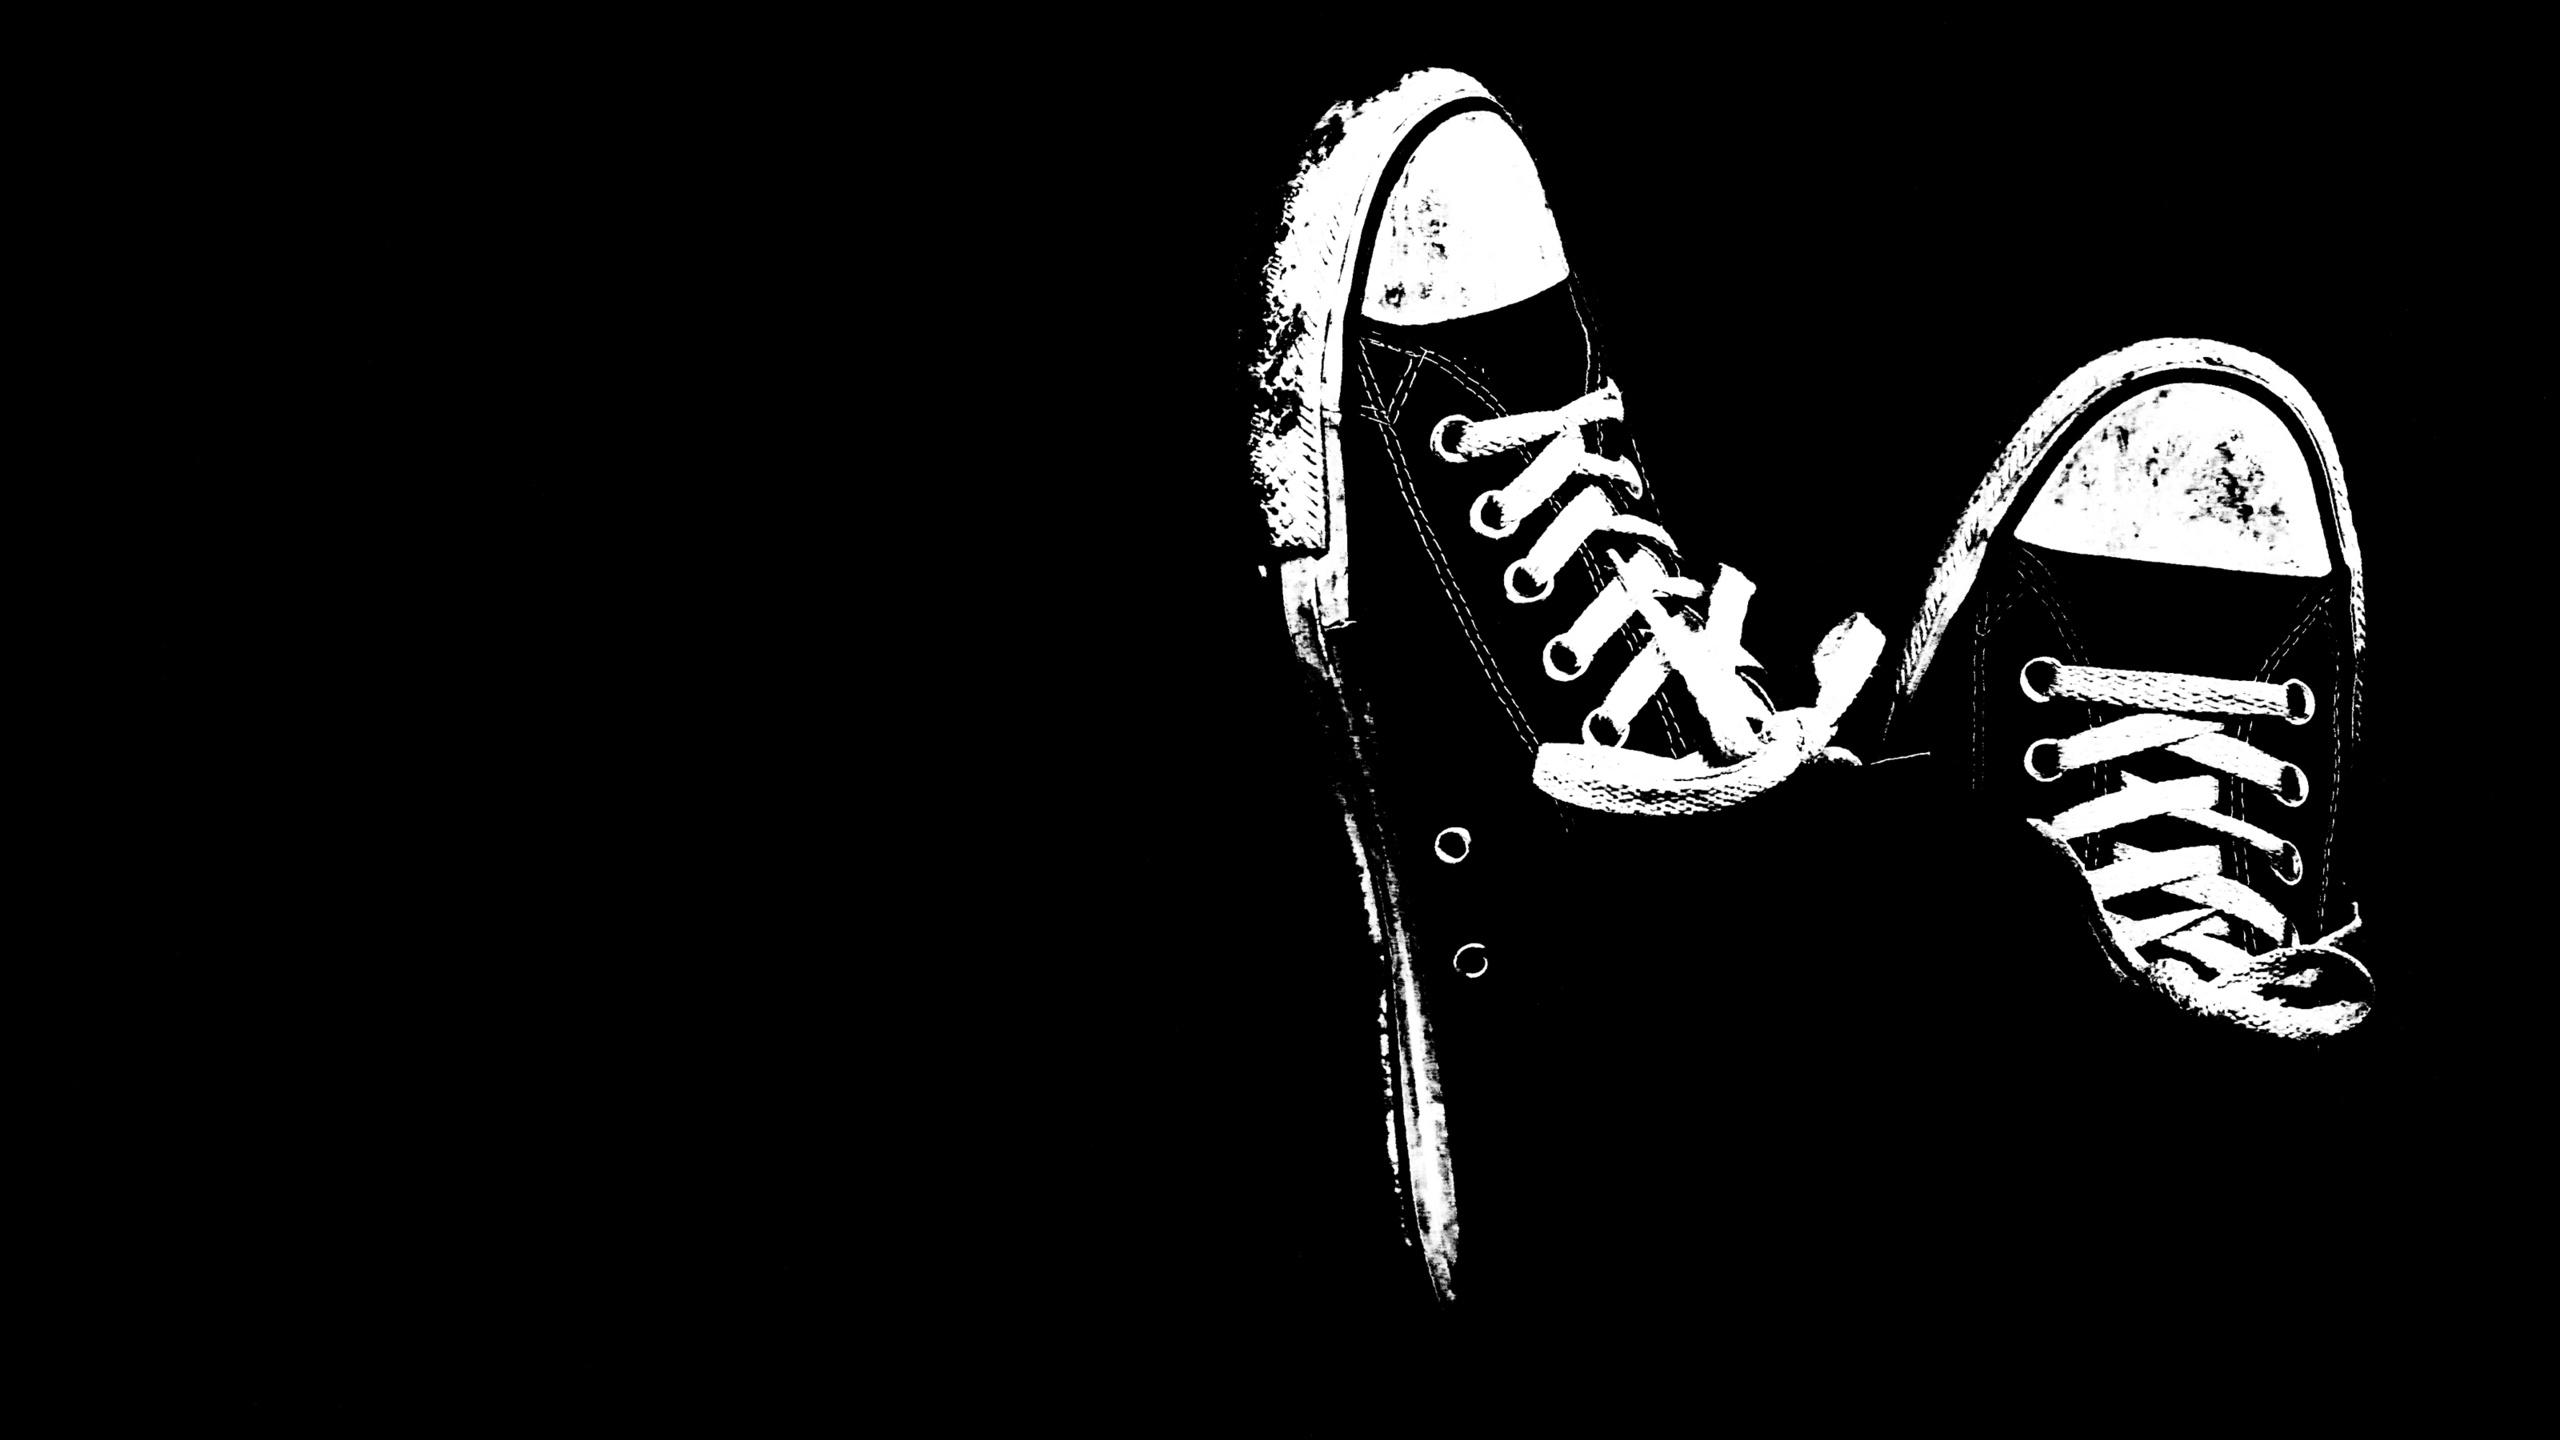 sneakers black and white-wallpaper-2560x1440.jpg